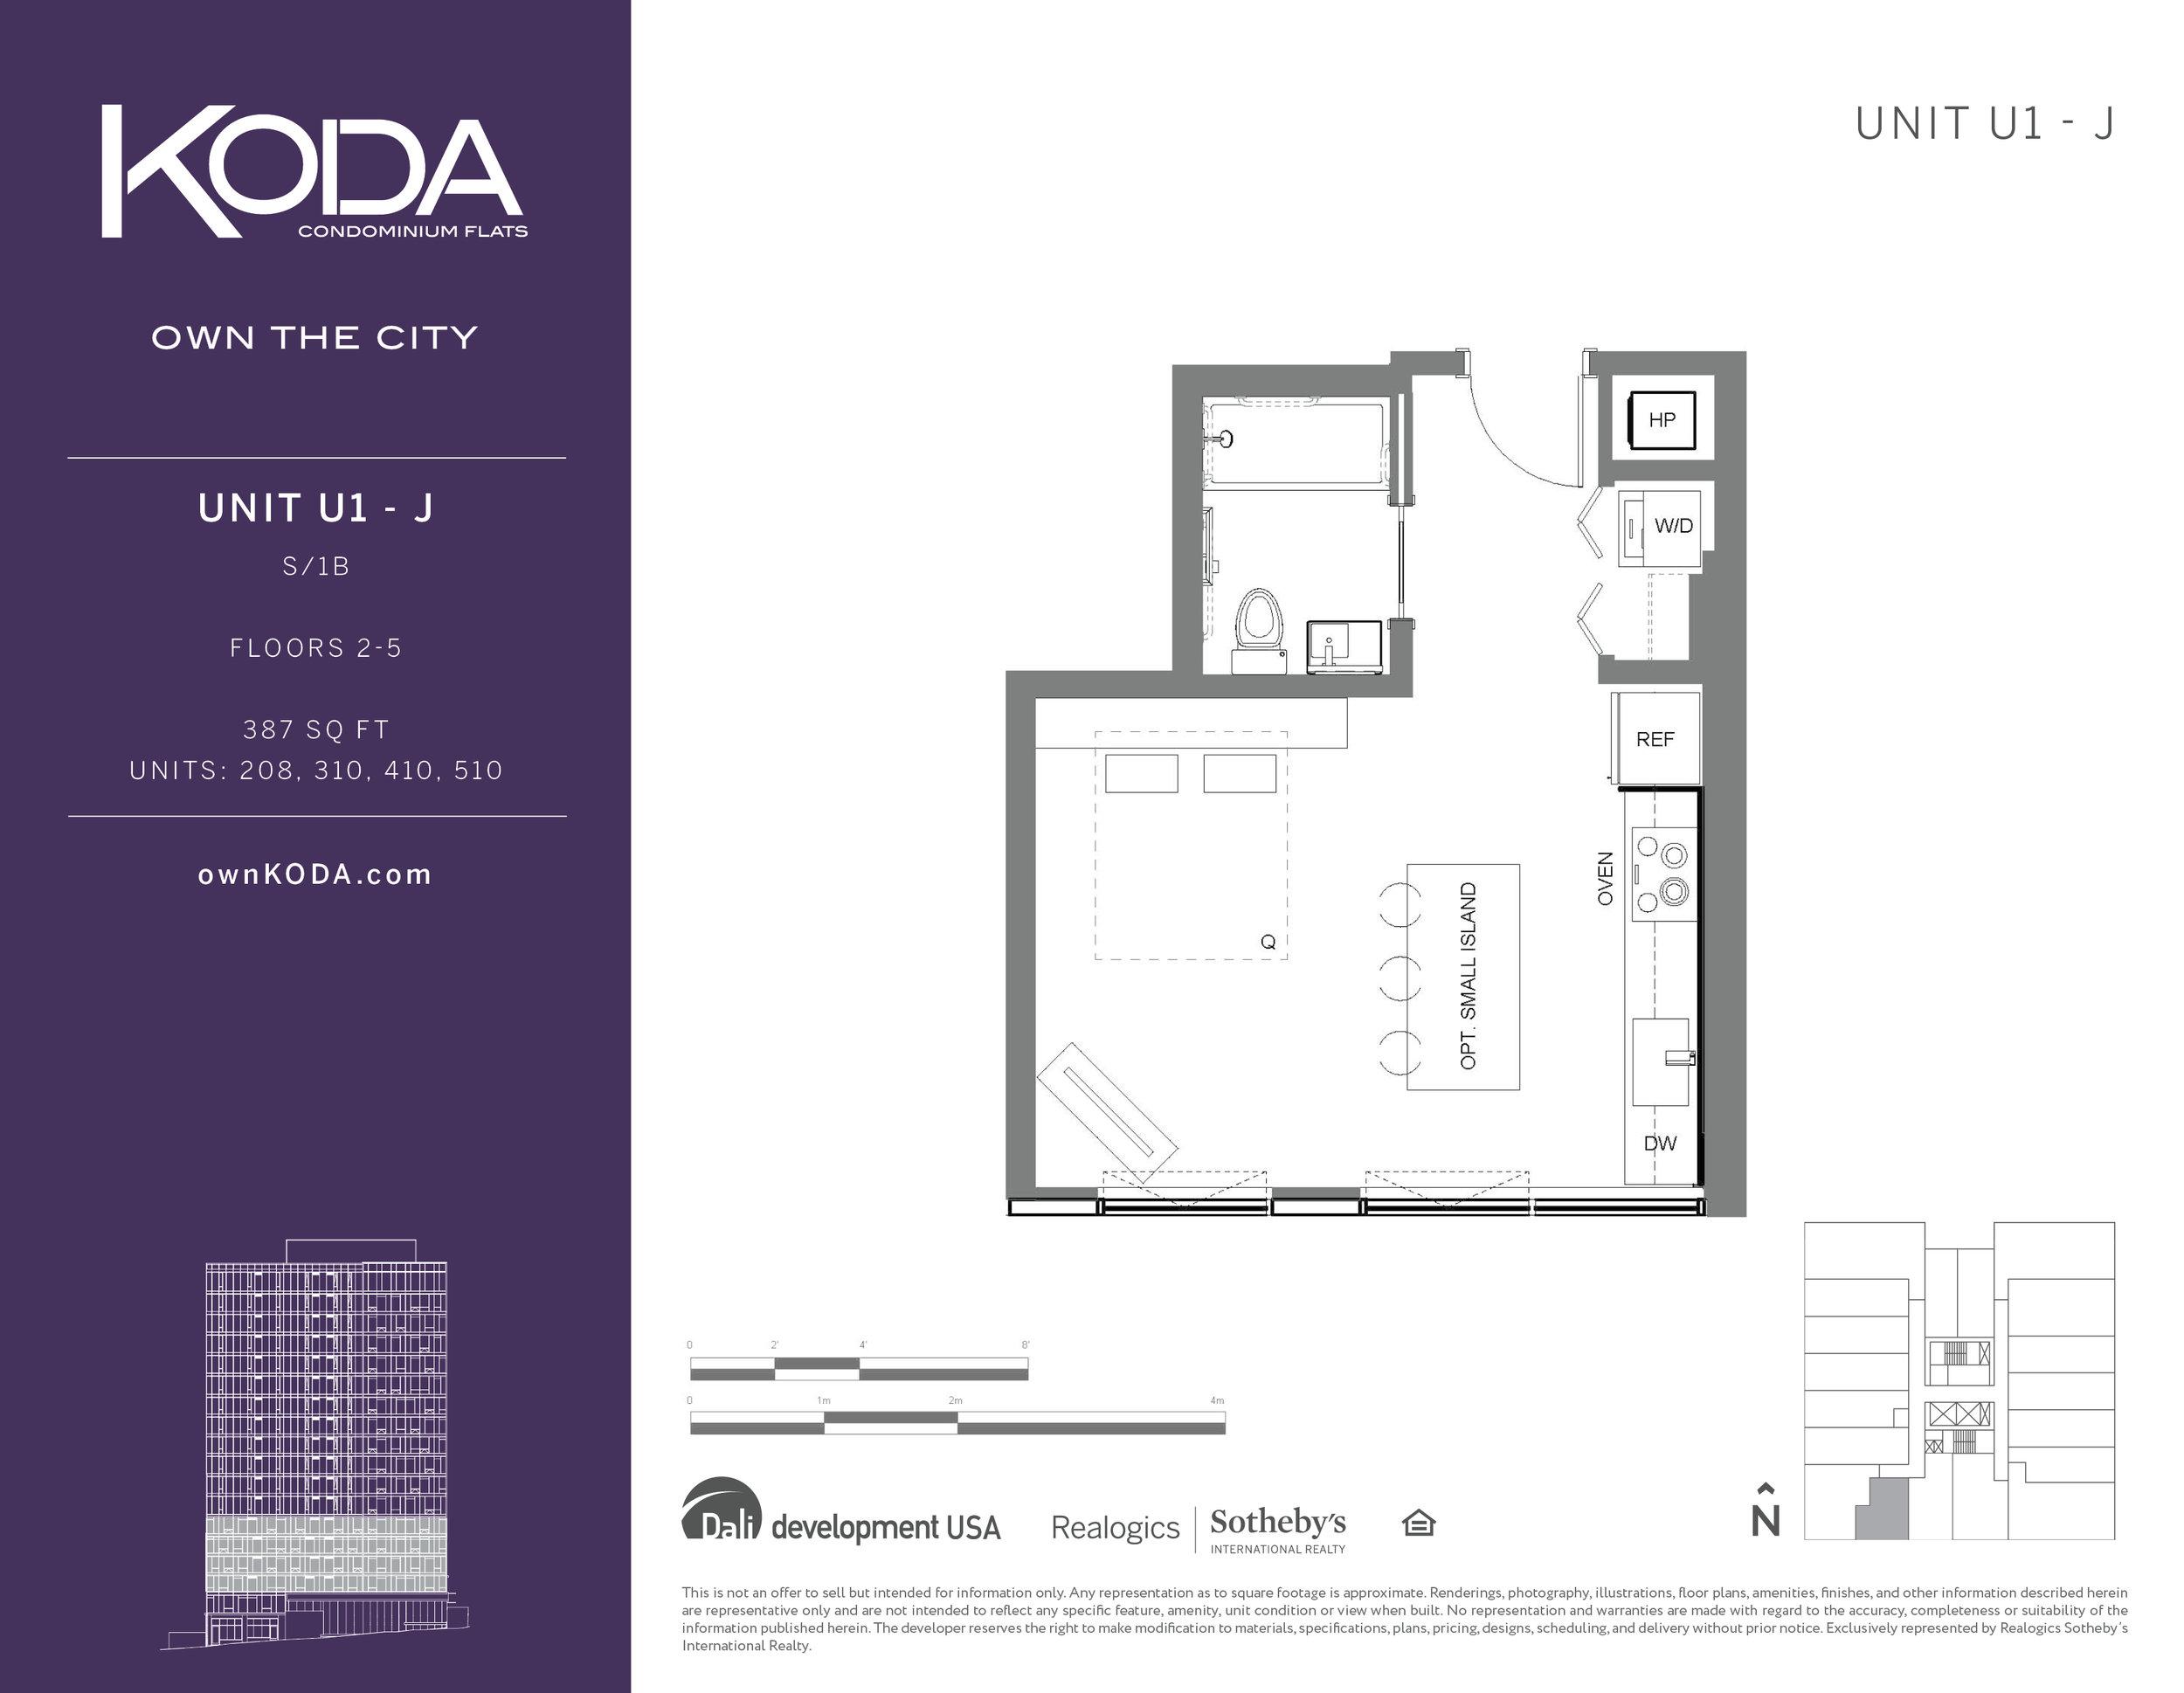 KODA_FloorPlanFlyer_Update_Approved_04.04.19_Release17.jpg